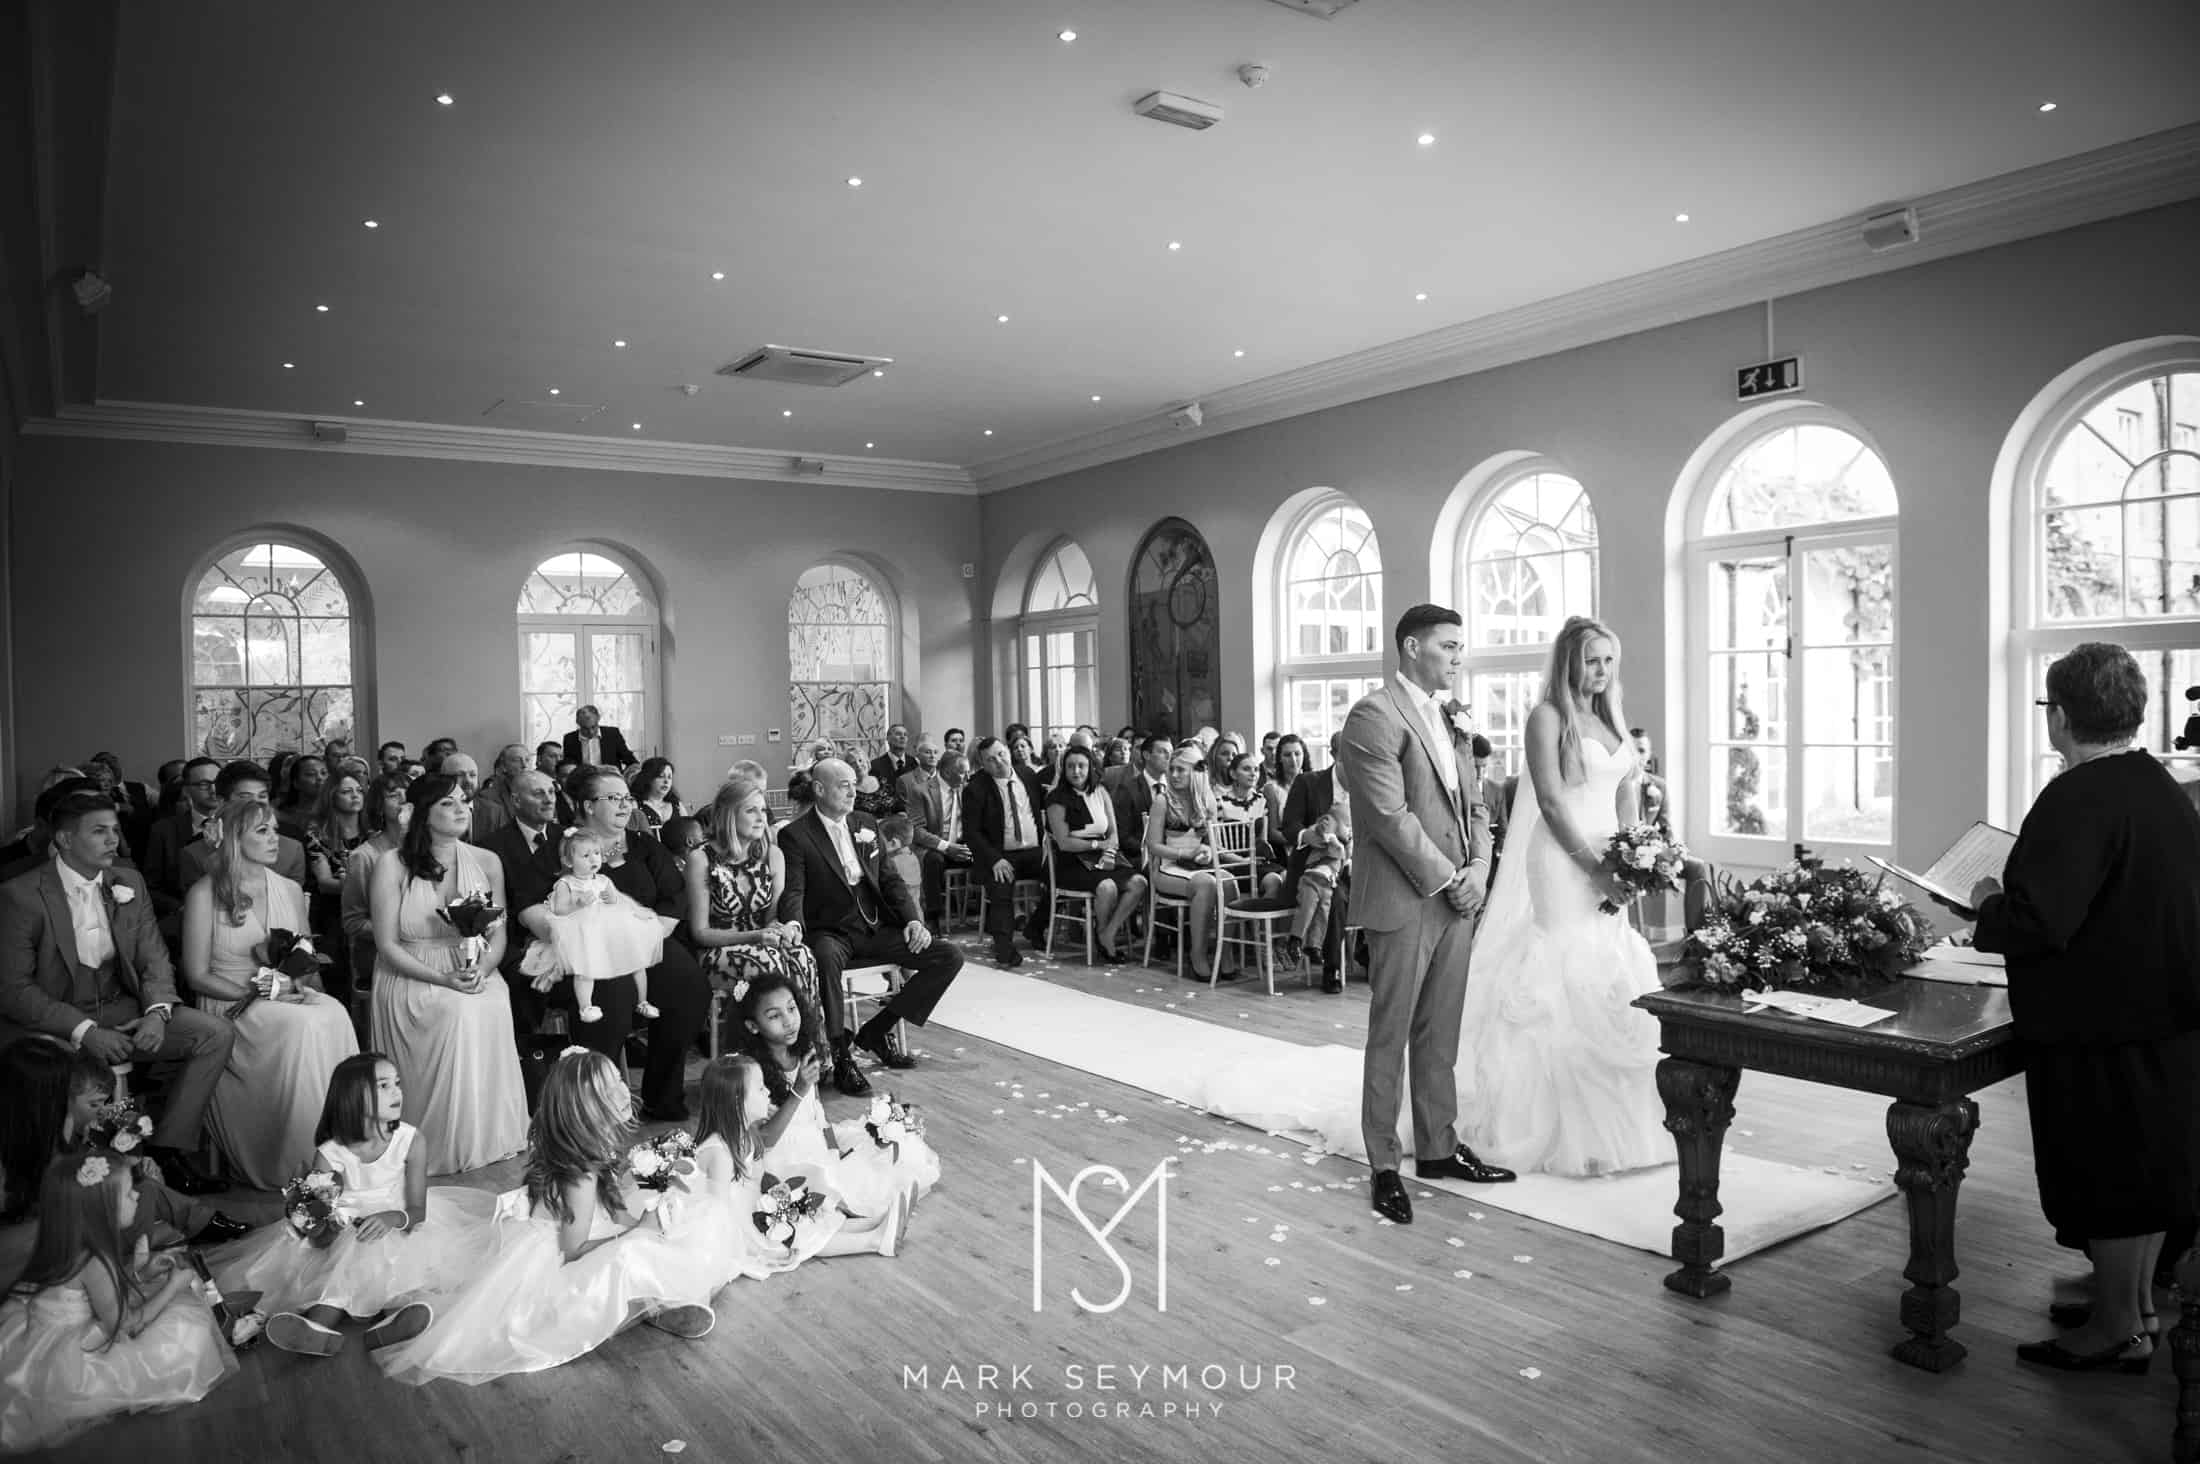 Wedding Ceremony at Braxted Park